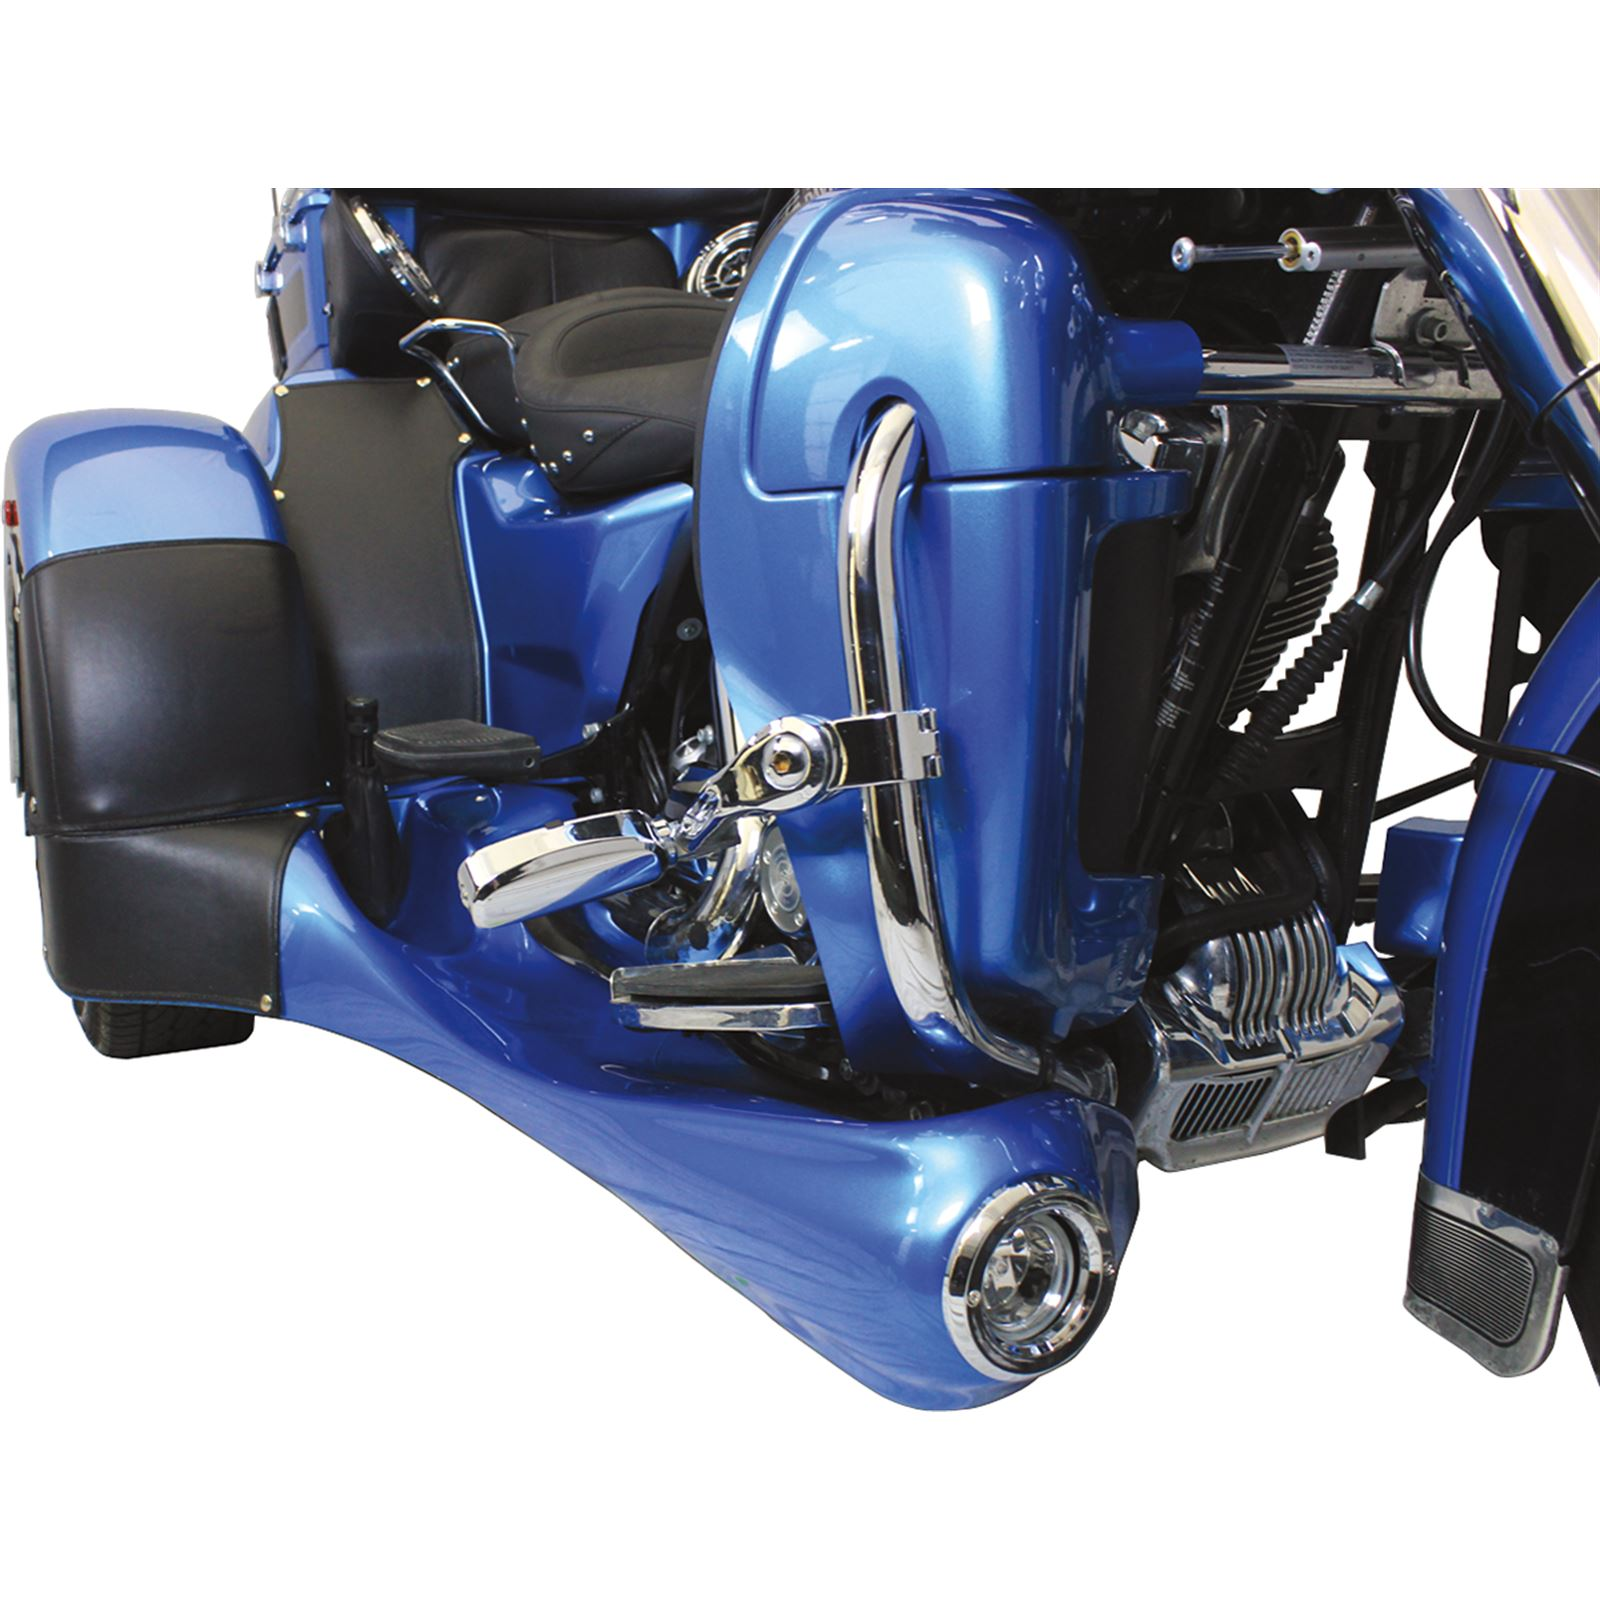 Motor Trike Trax Bra